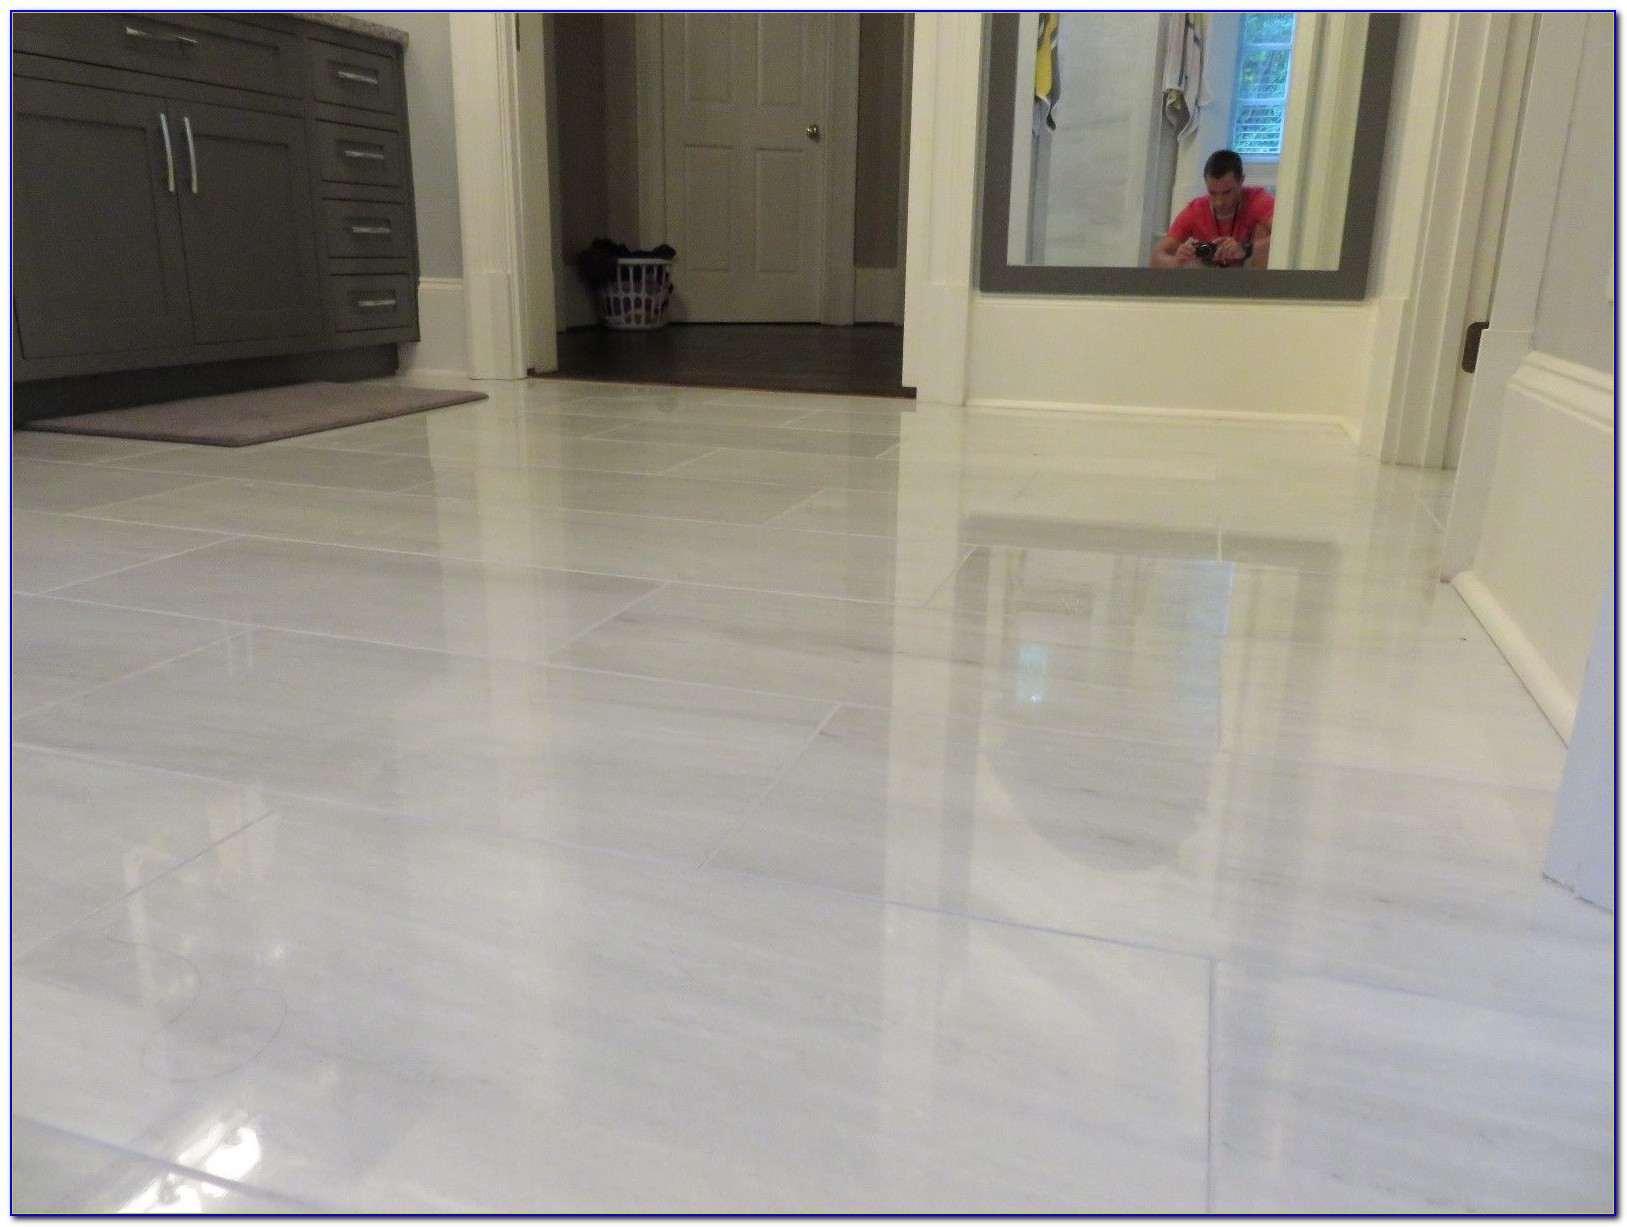 Leveling Floor For Tile Installation